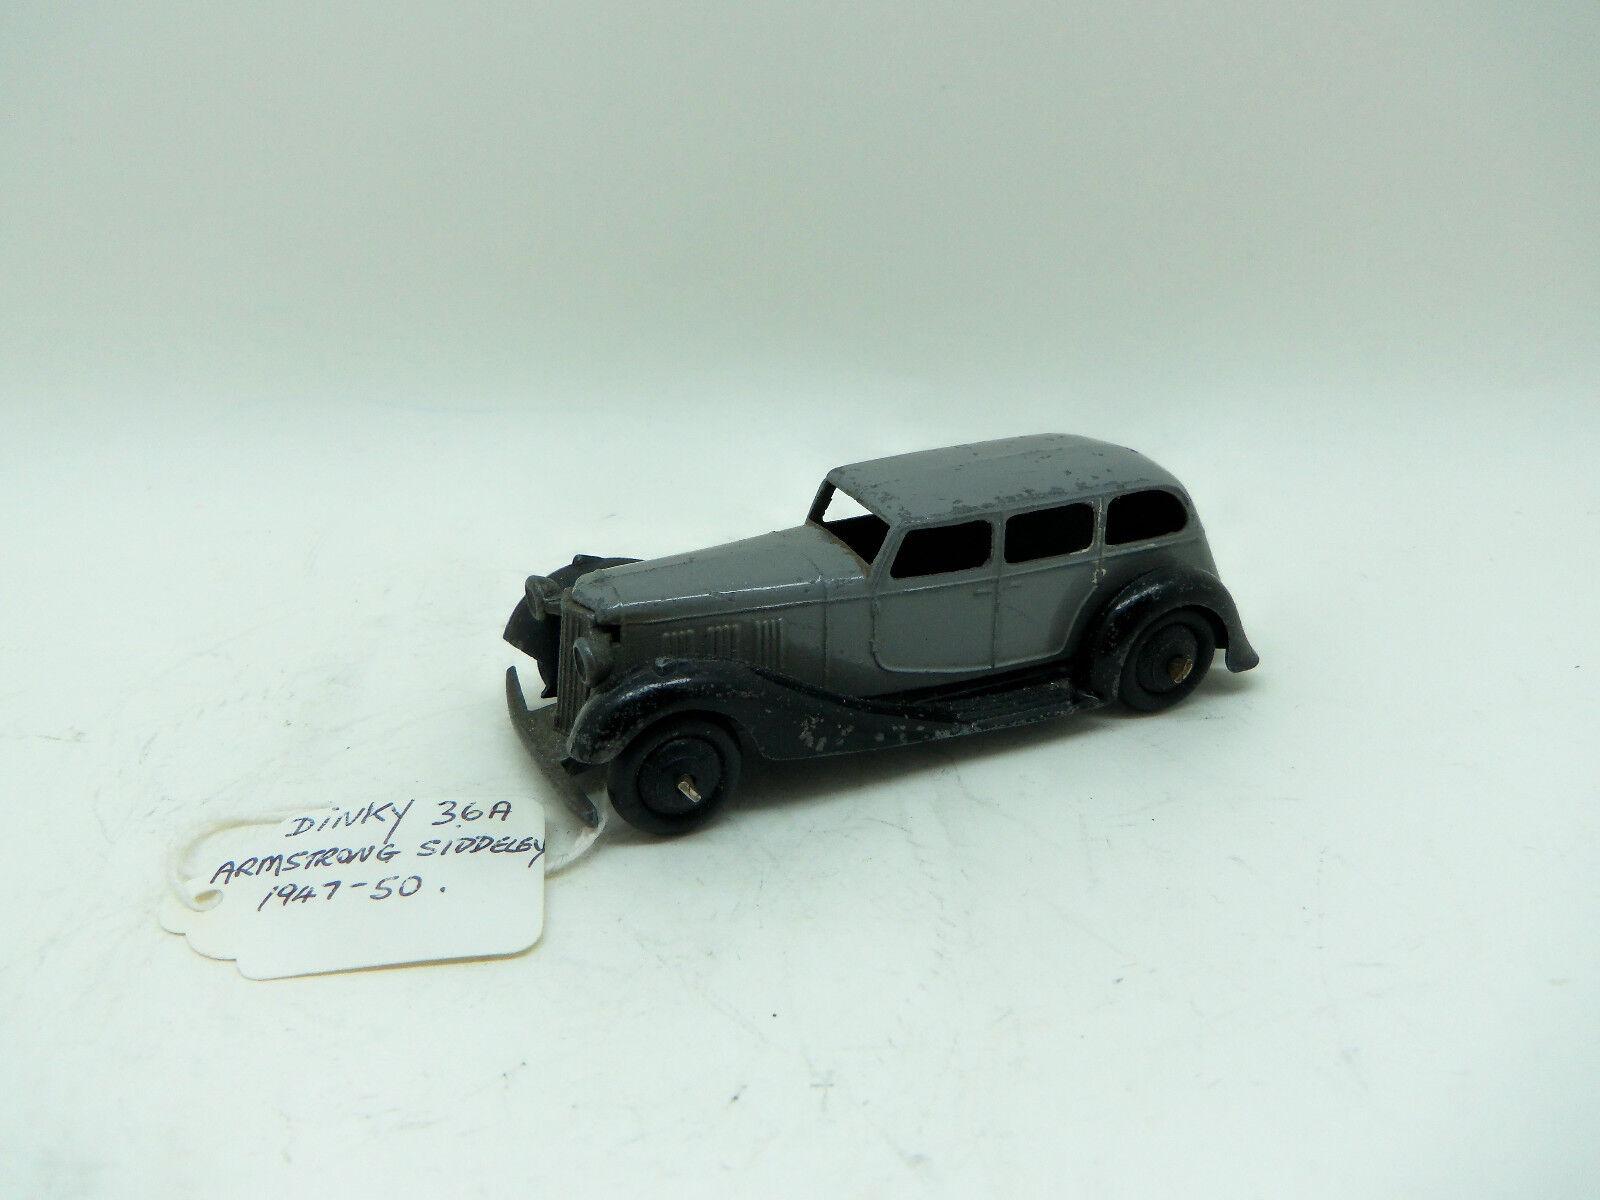 Dinky Toys No.36A Armstrong Siddeley 1947-50 - Original